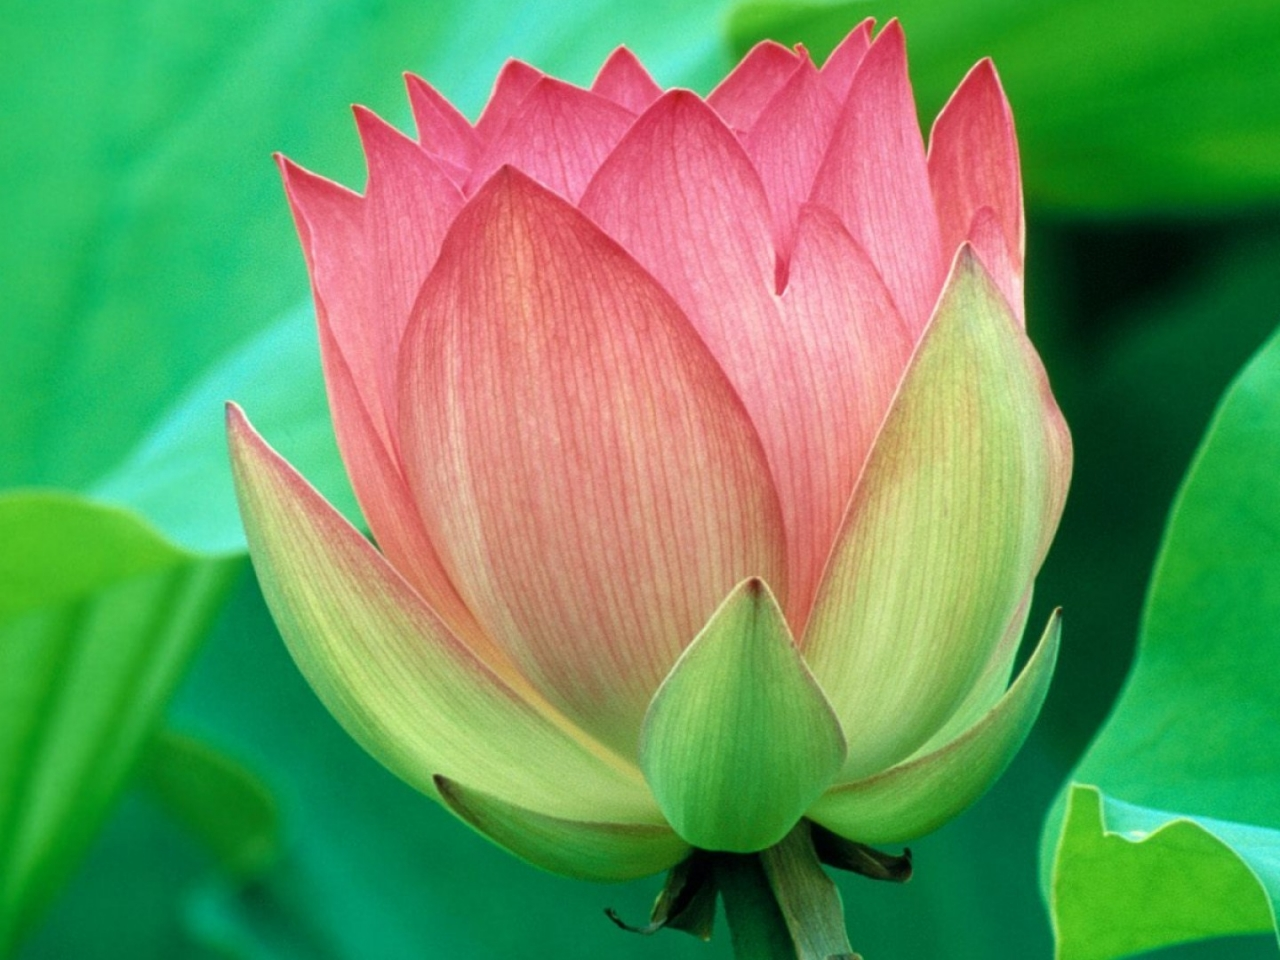 Bella flor - 1280x960